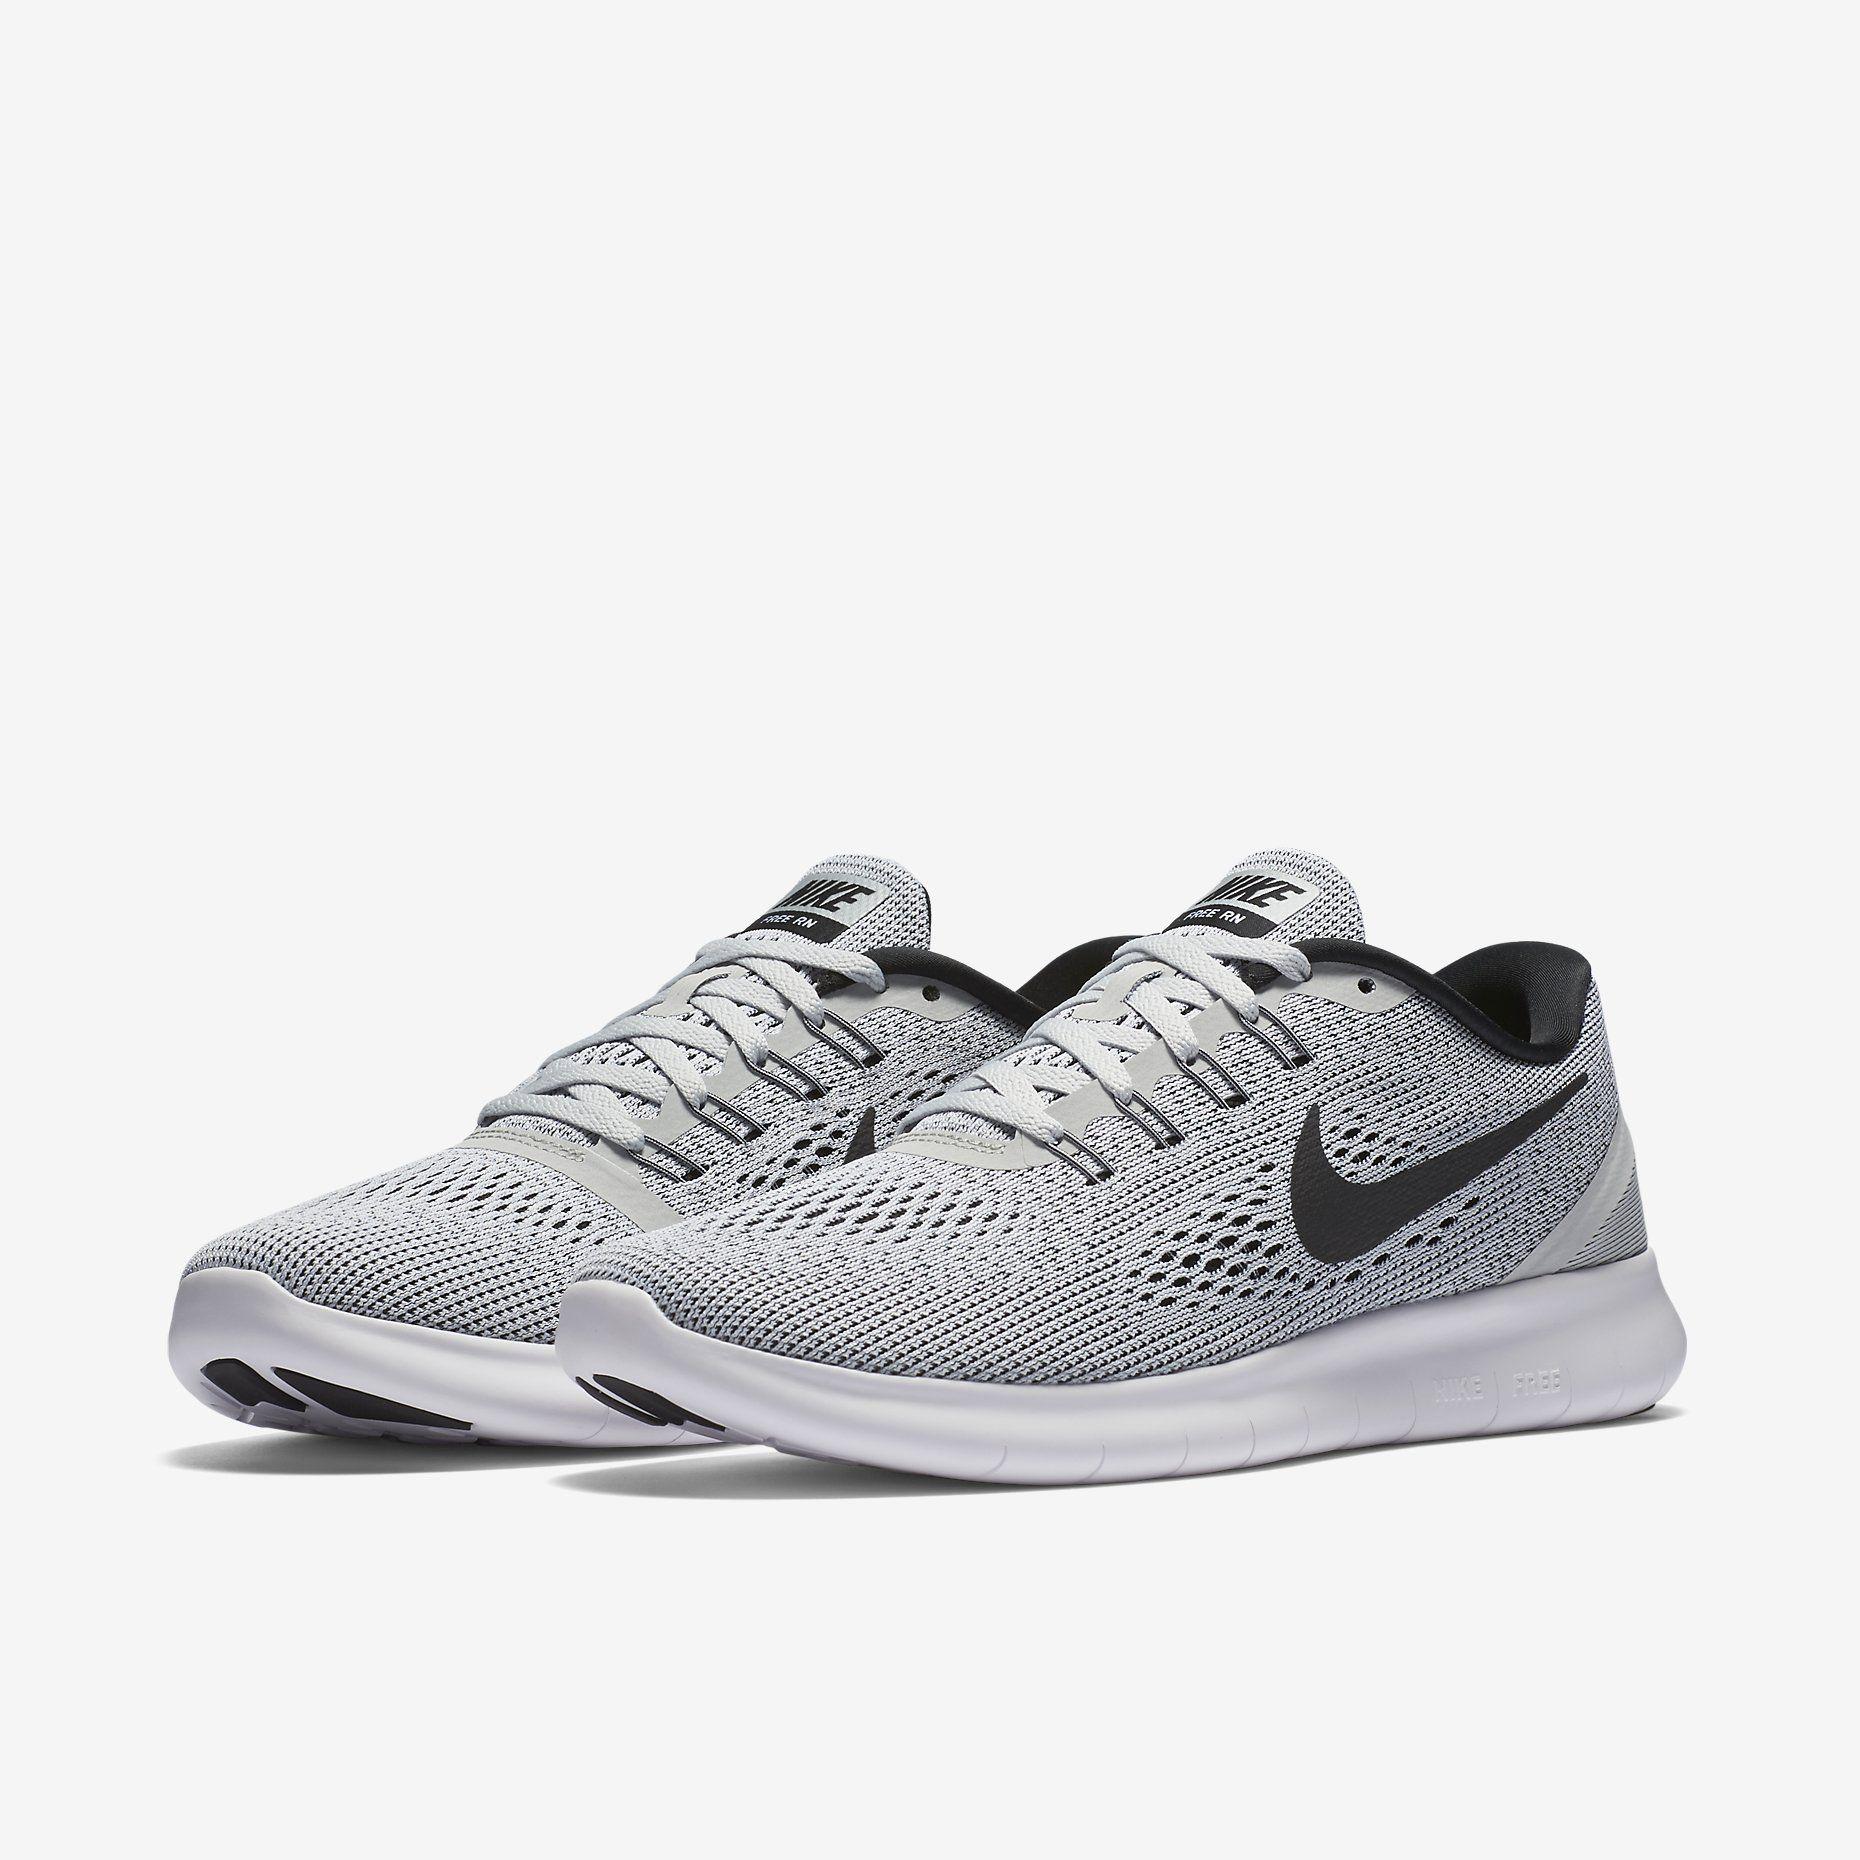 newest 41434 bf7d5 110€ Nike Free Noir ou Grise en taille 39 ou 40